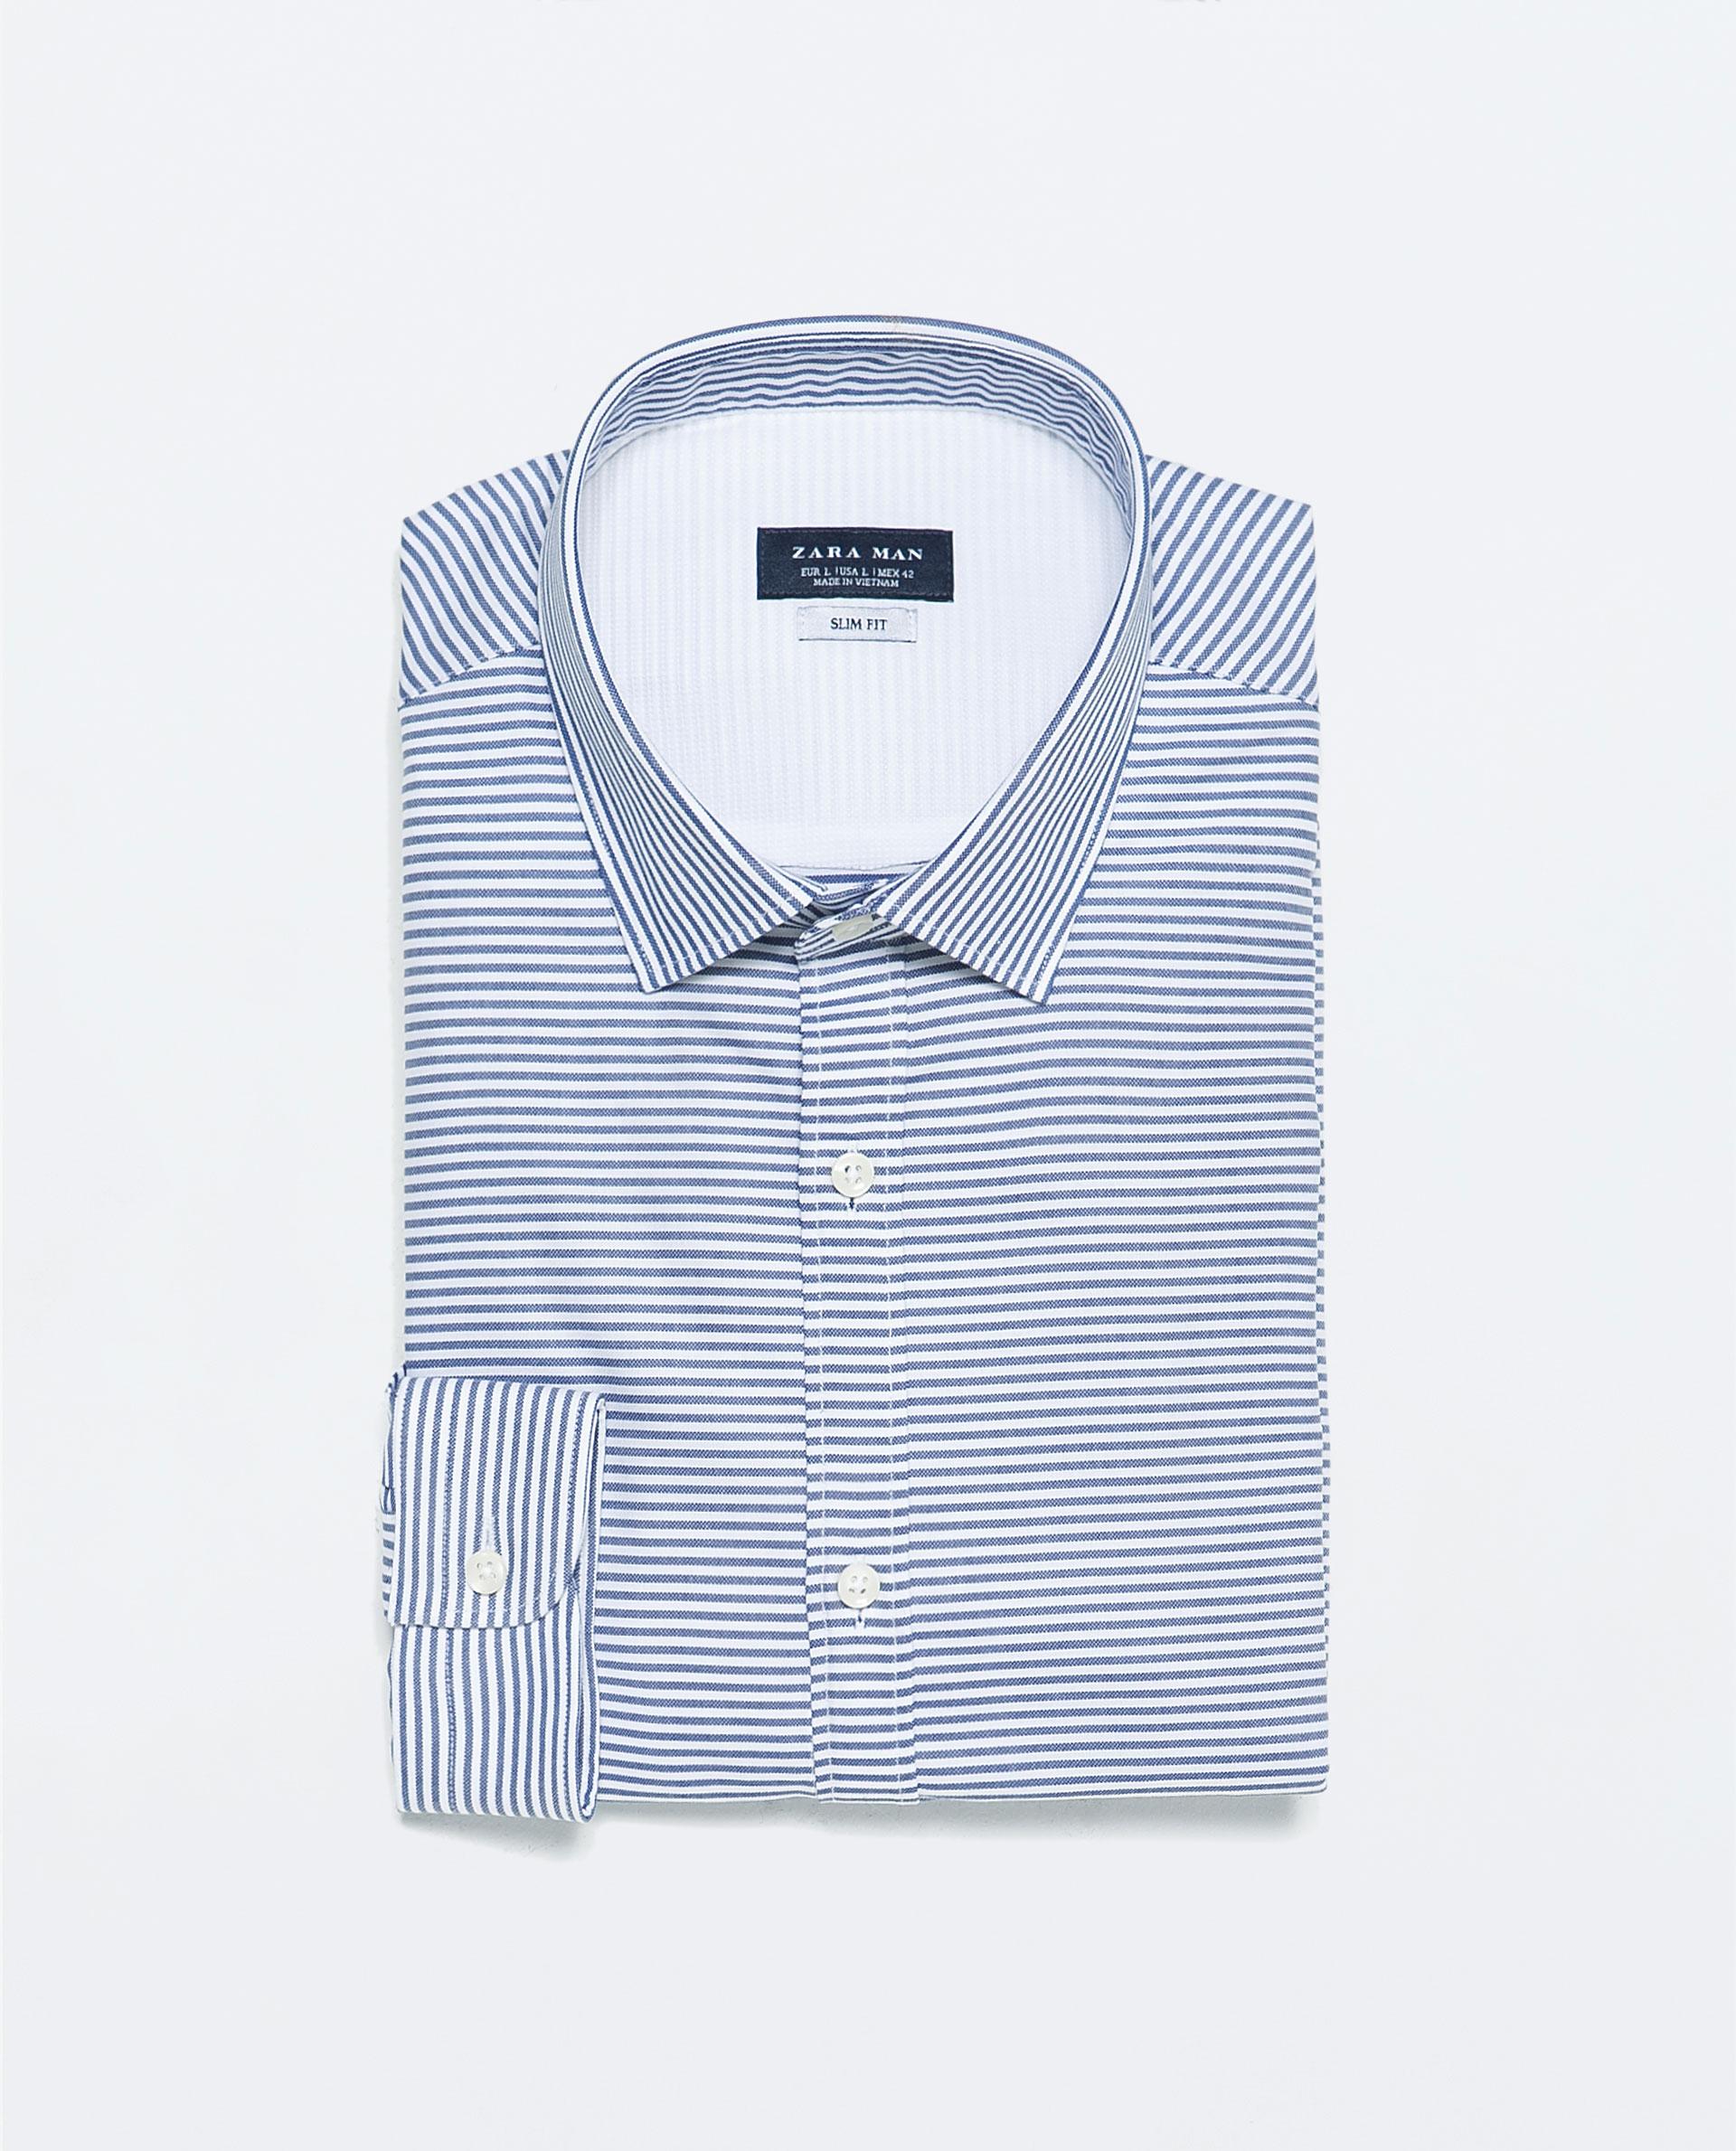 Zara horizontal stripe shirt horizontal stripe shirt in for Horizontal striped dress shirts men